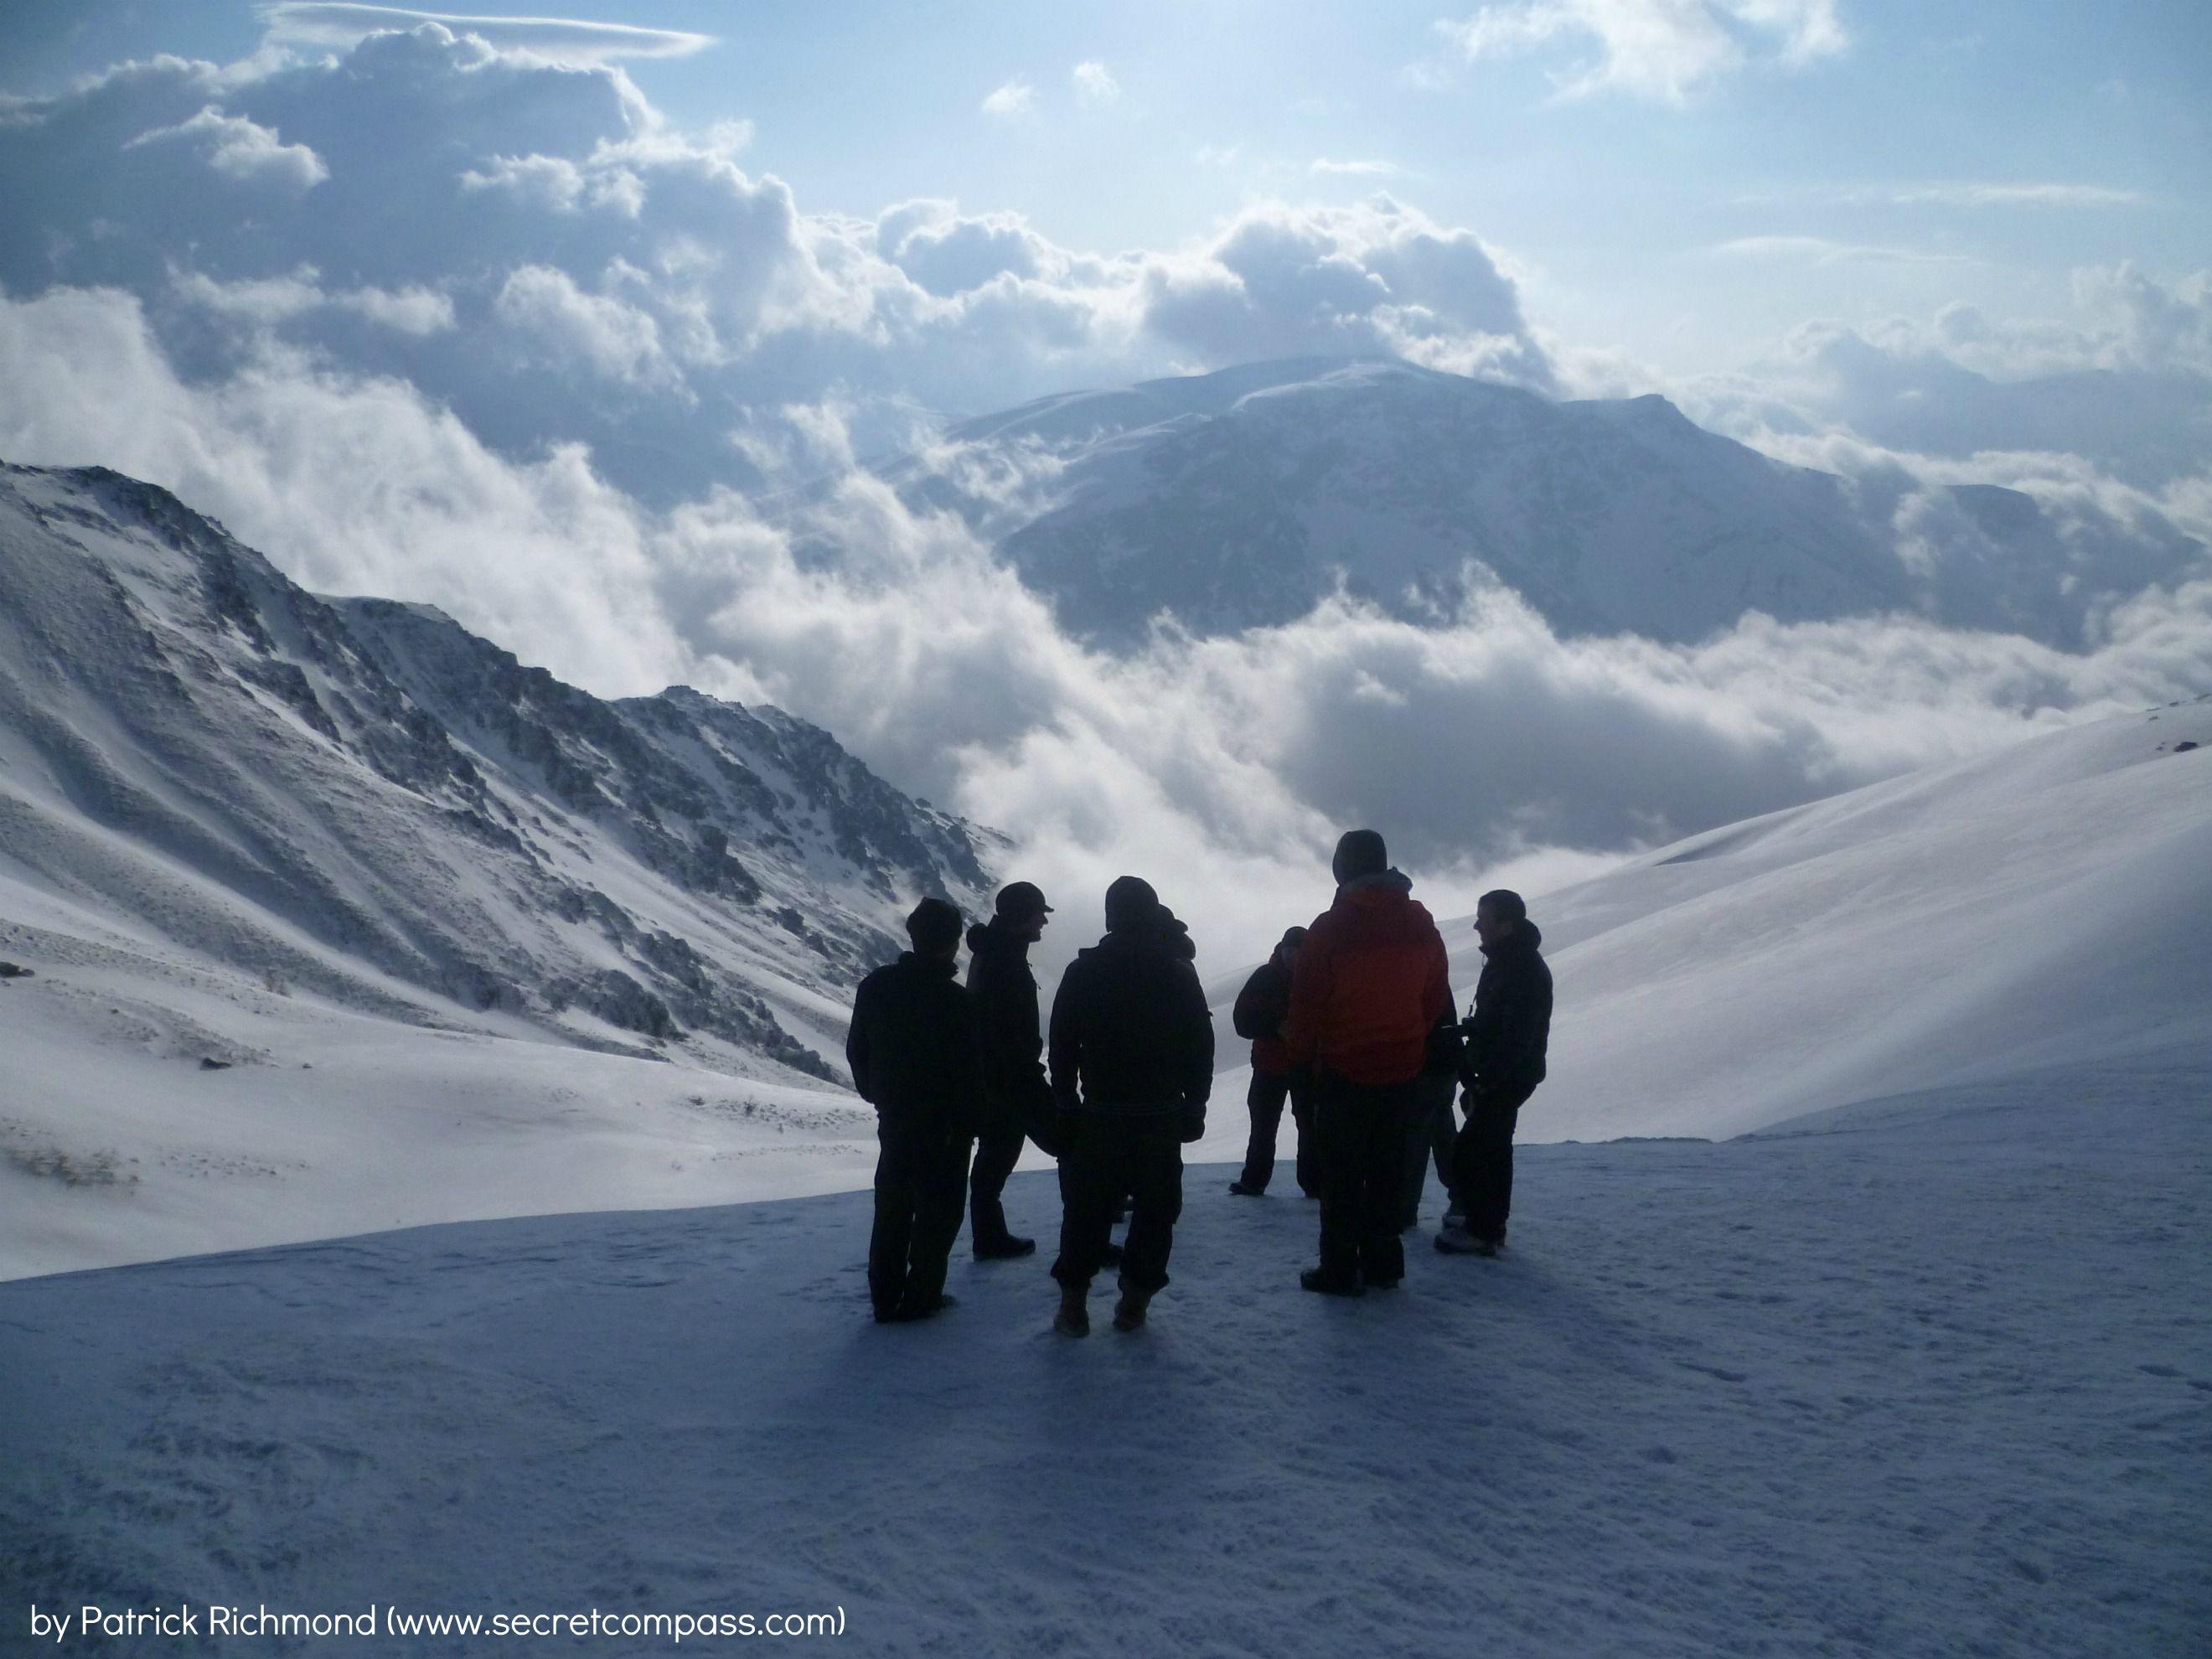 -15 on Mt Halgurd, Zagros Mountains, Northern Iraq. Secret Compass Expedition to Iraq, March 2012.